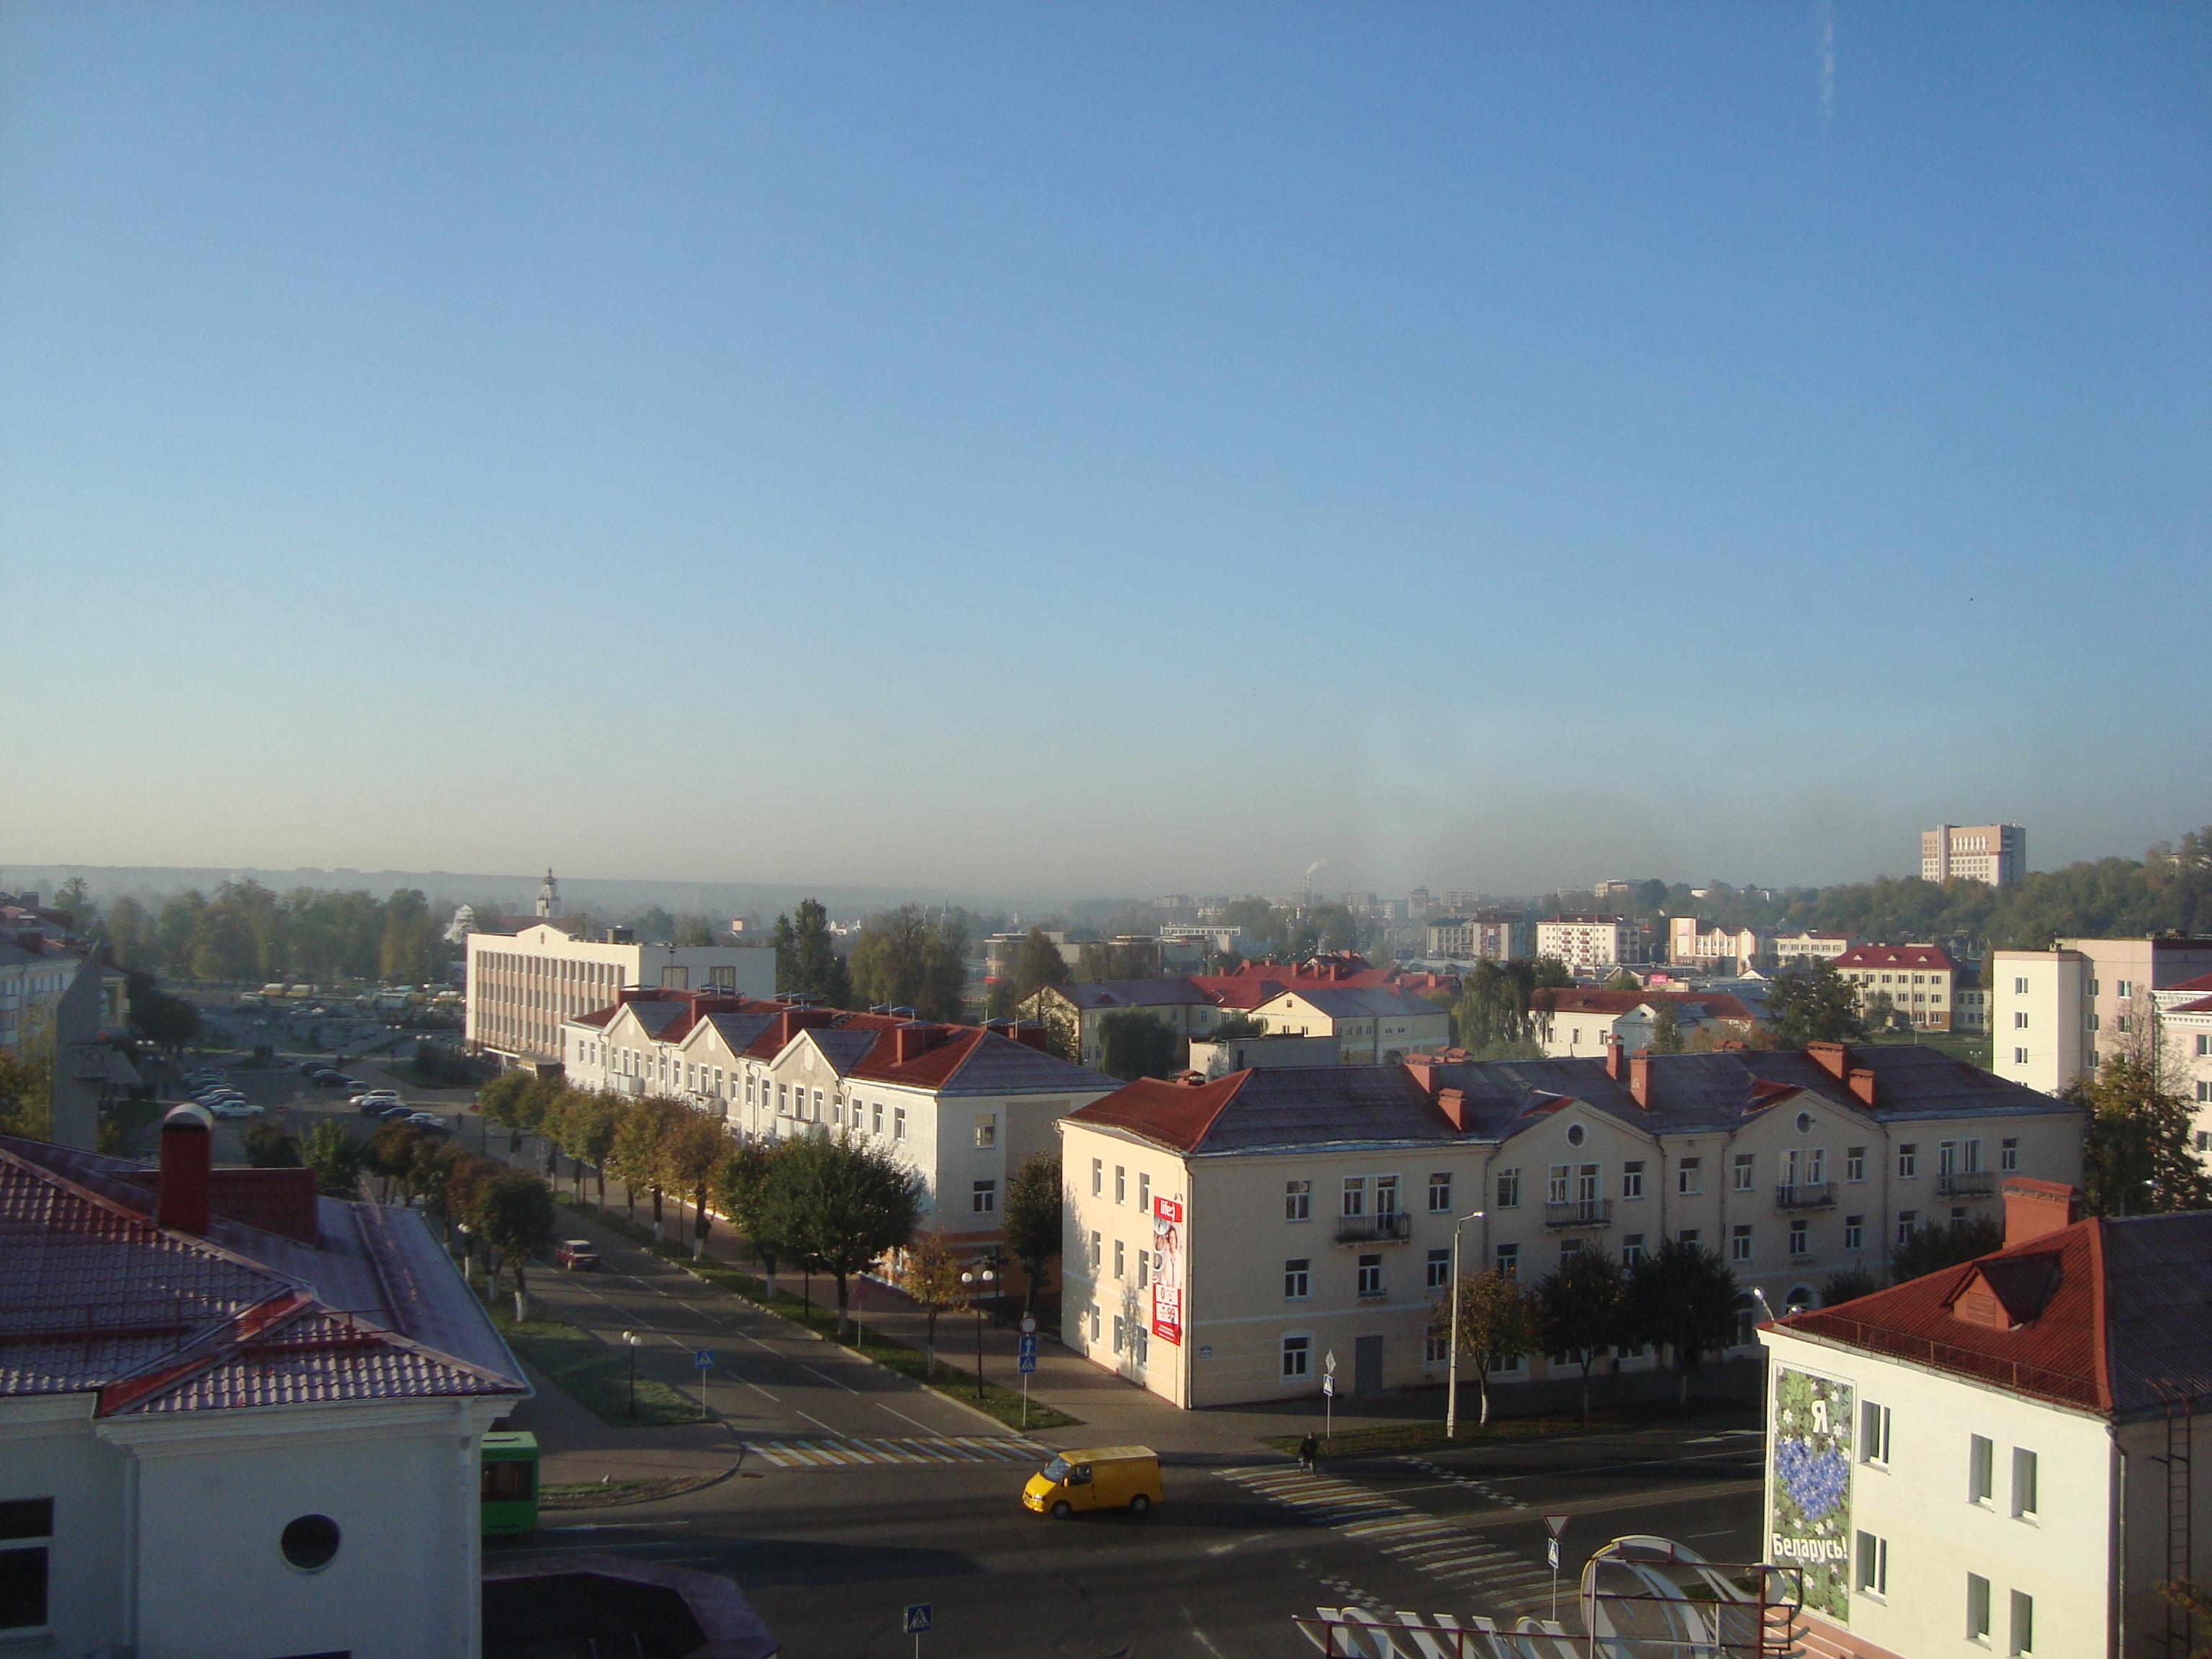 http://upload.wikimedia.org/wikipedia/commons/e/e7/Orsha_city_2010.JPG